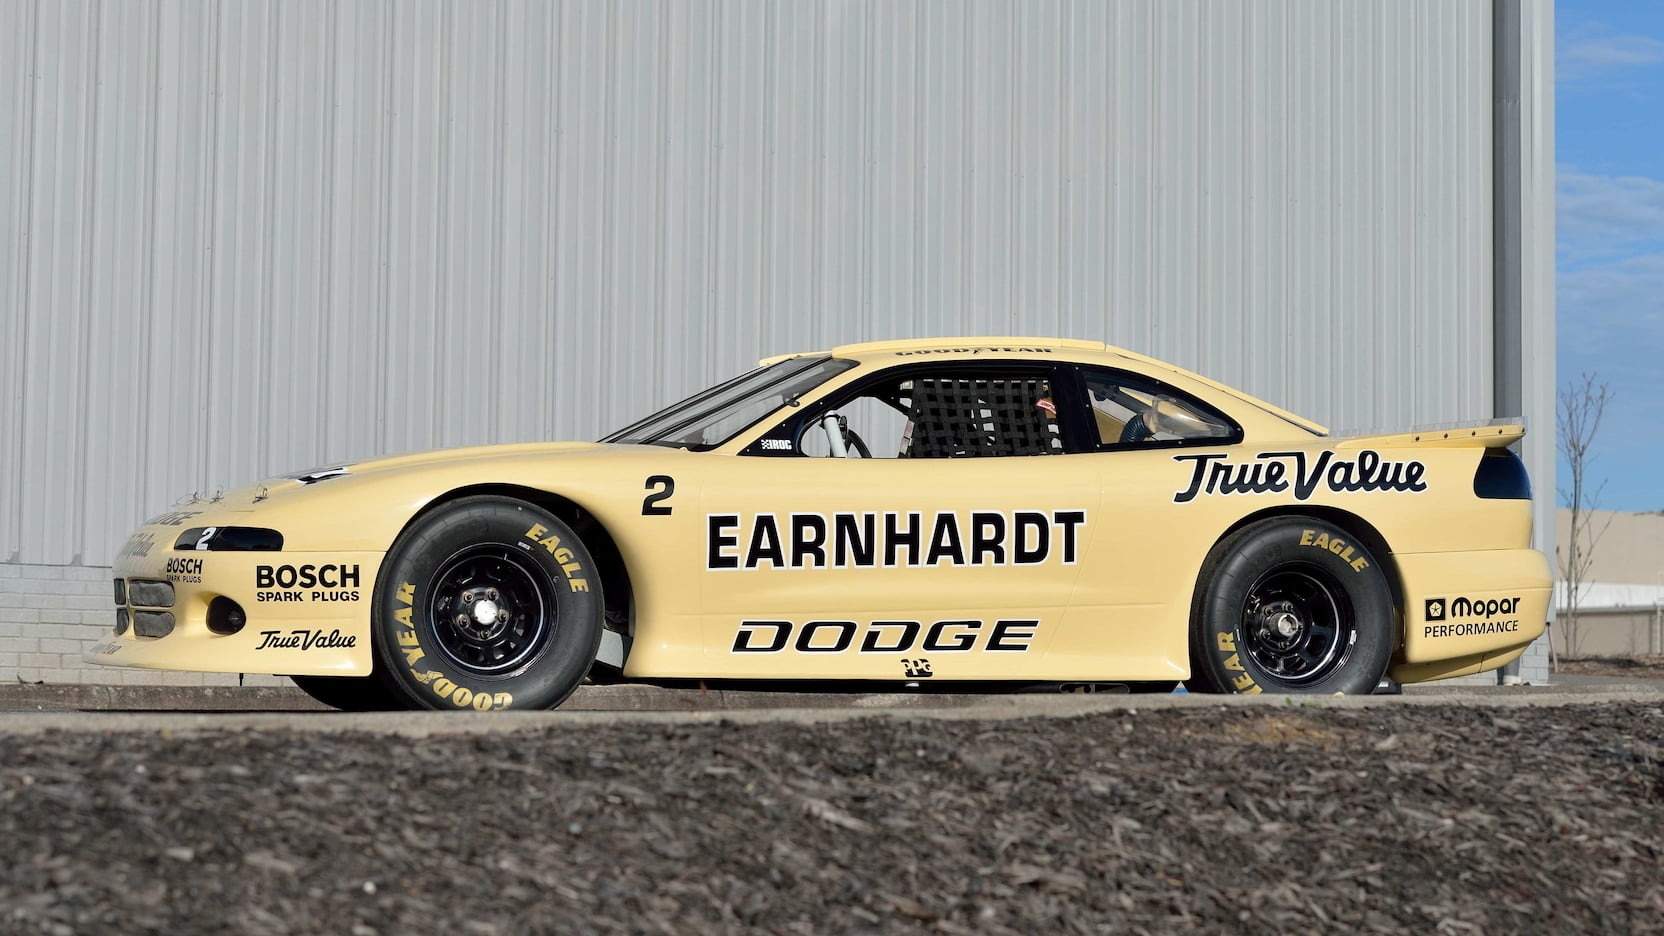 1994 Dodge Avenger IROC race car